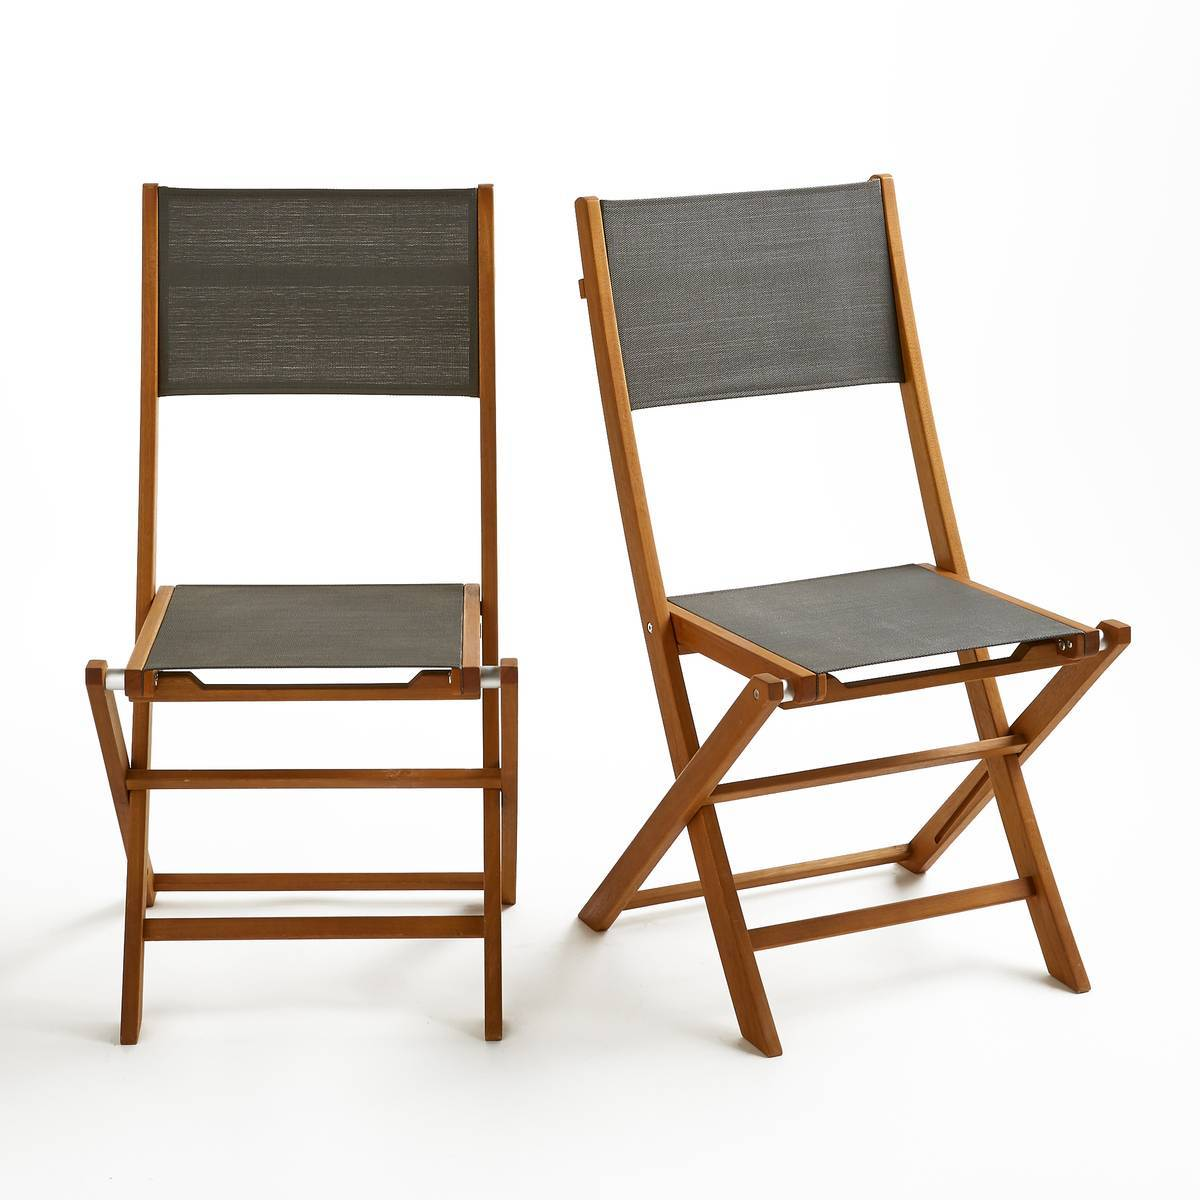 LA REDOUTE INTERIEURS Chaise de jardin pliante (lot de 2), Exodor